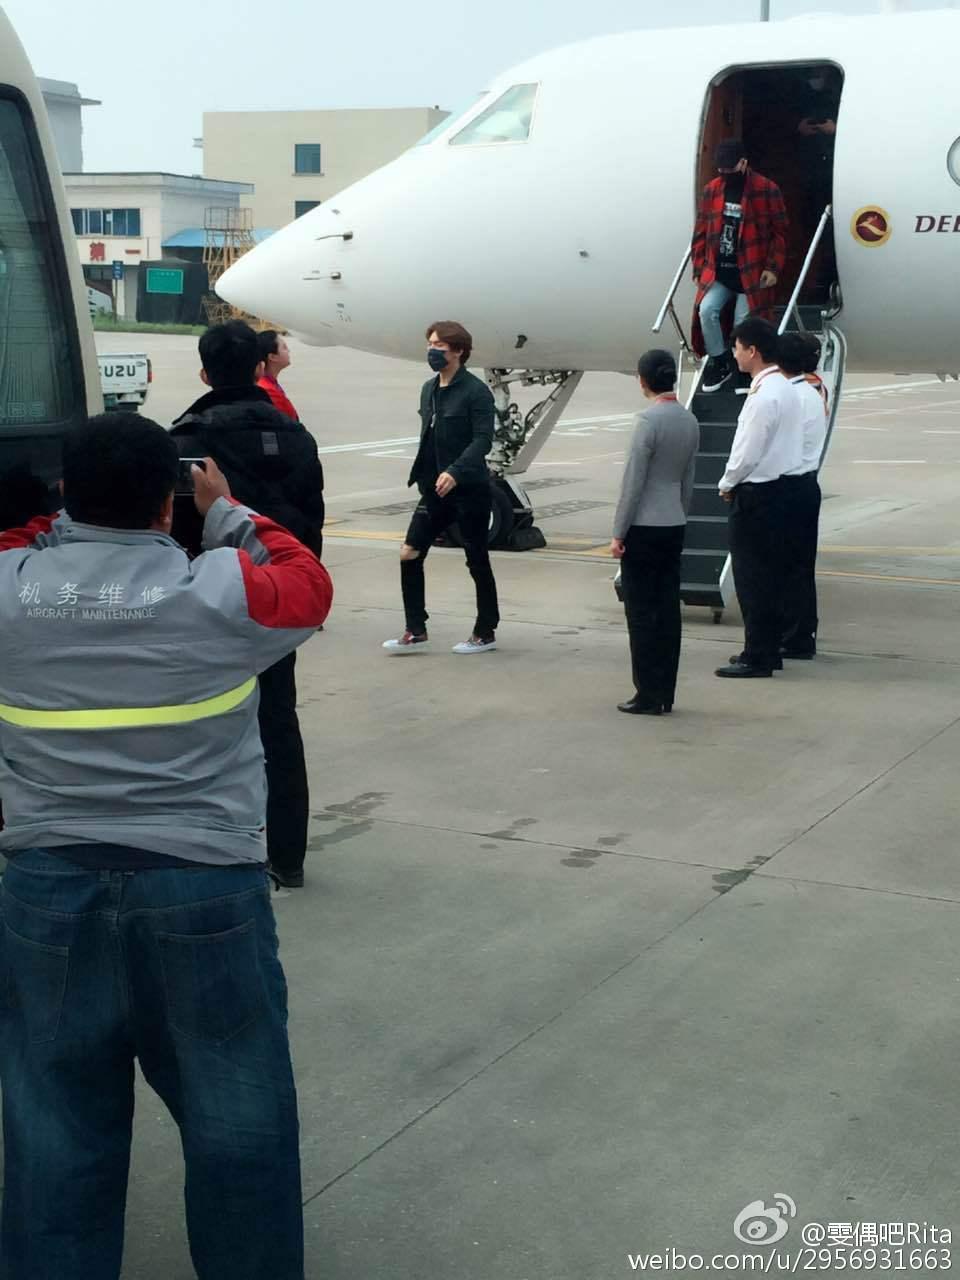 BIGBANG Arrival Changsha 2016-03-26 雯偶吧Rita (1)